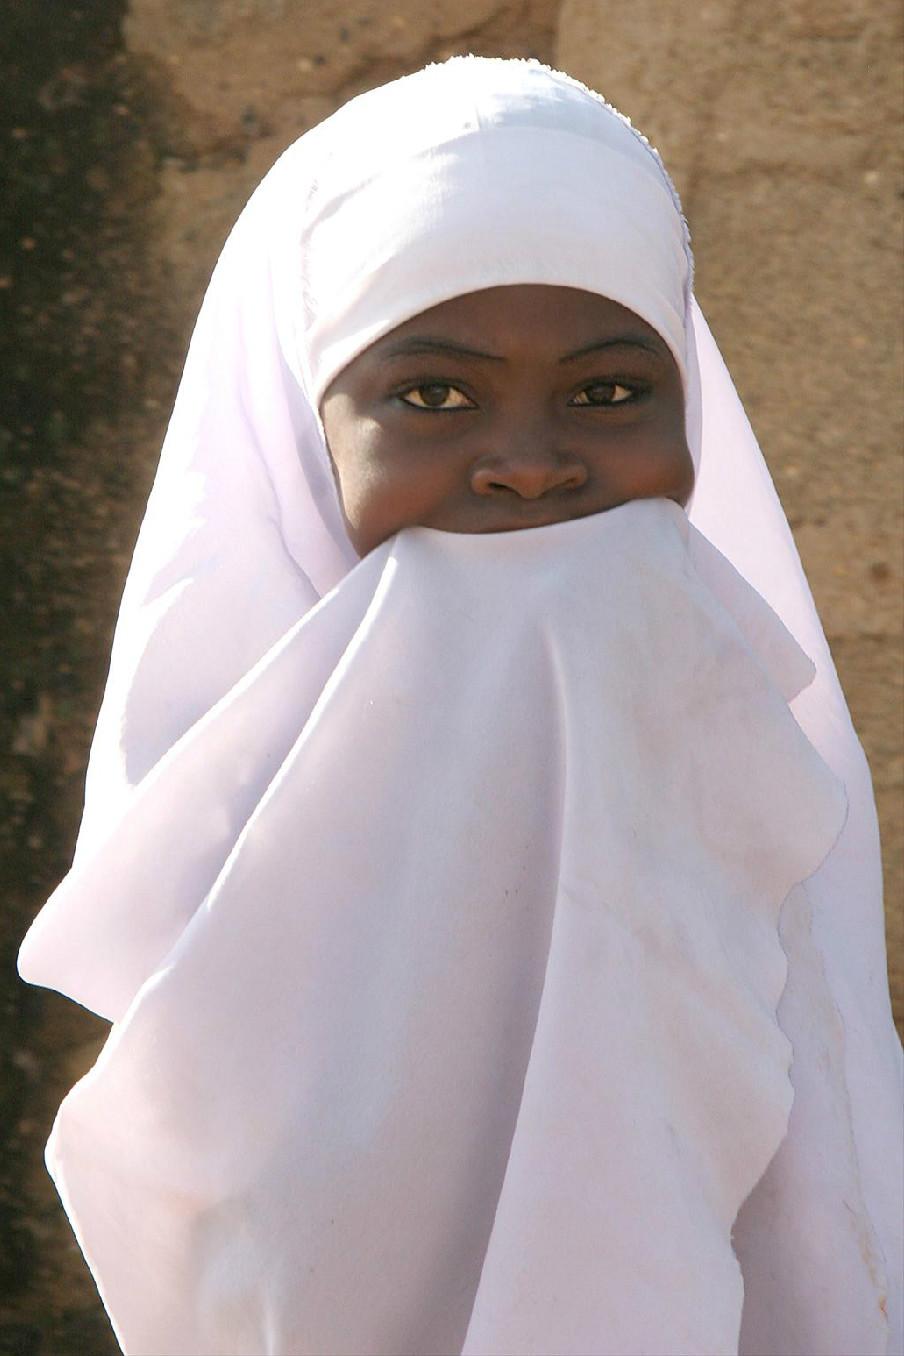 Bauchi girl, Northern Nigeria.